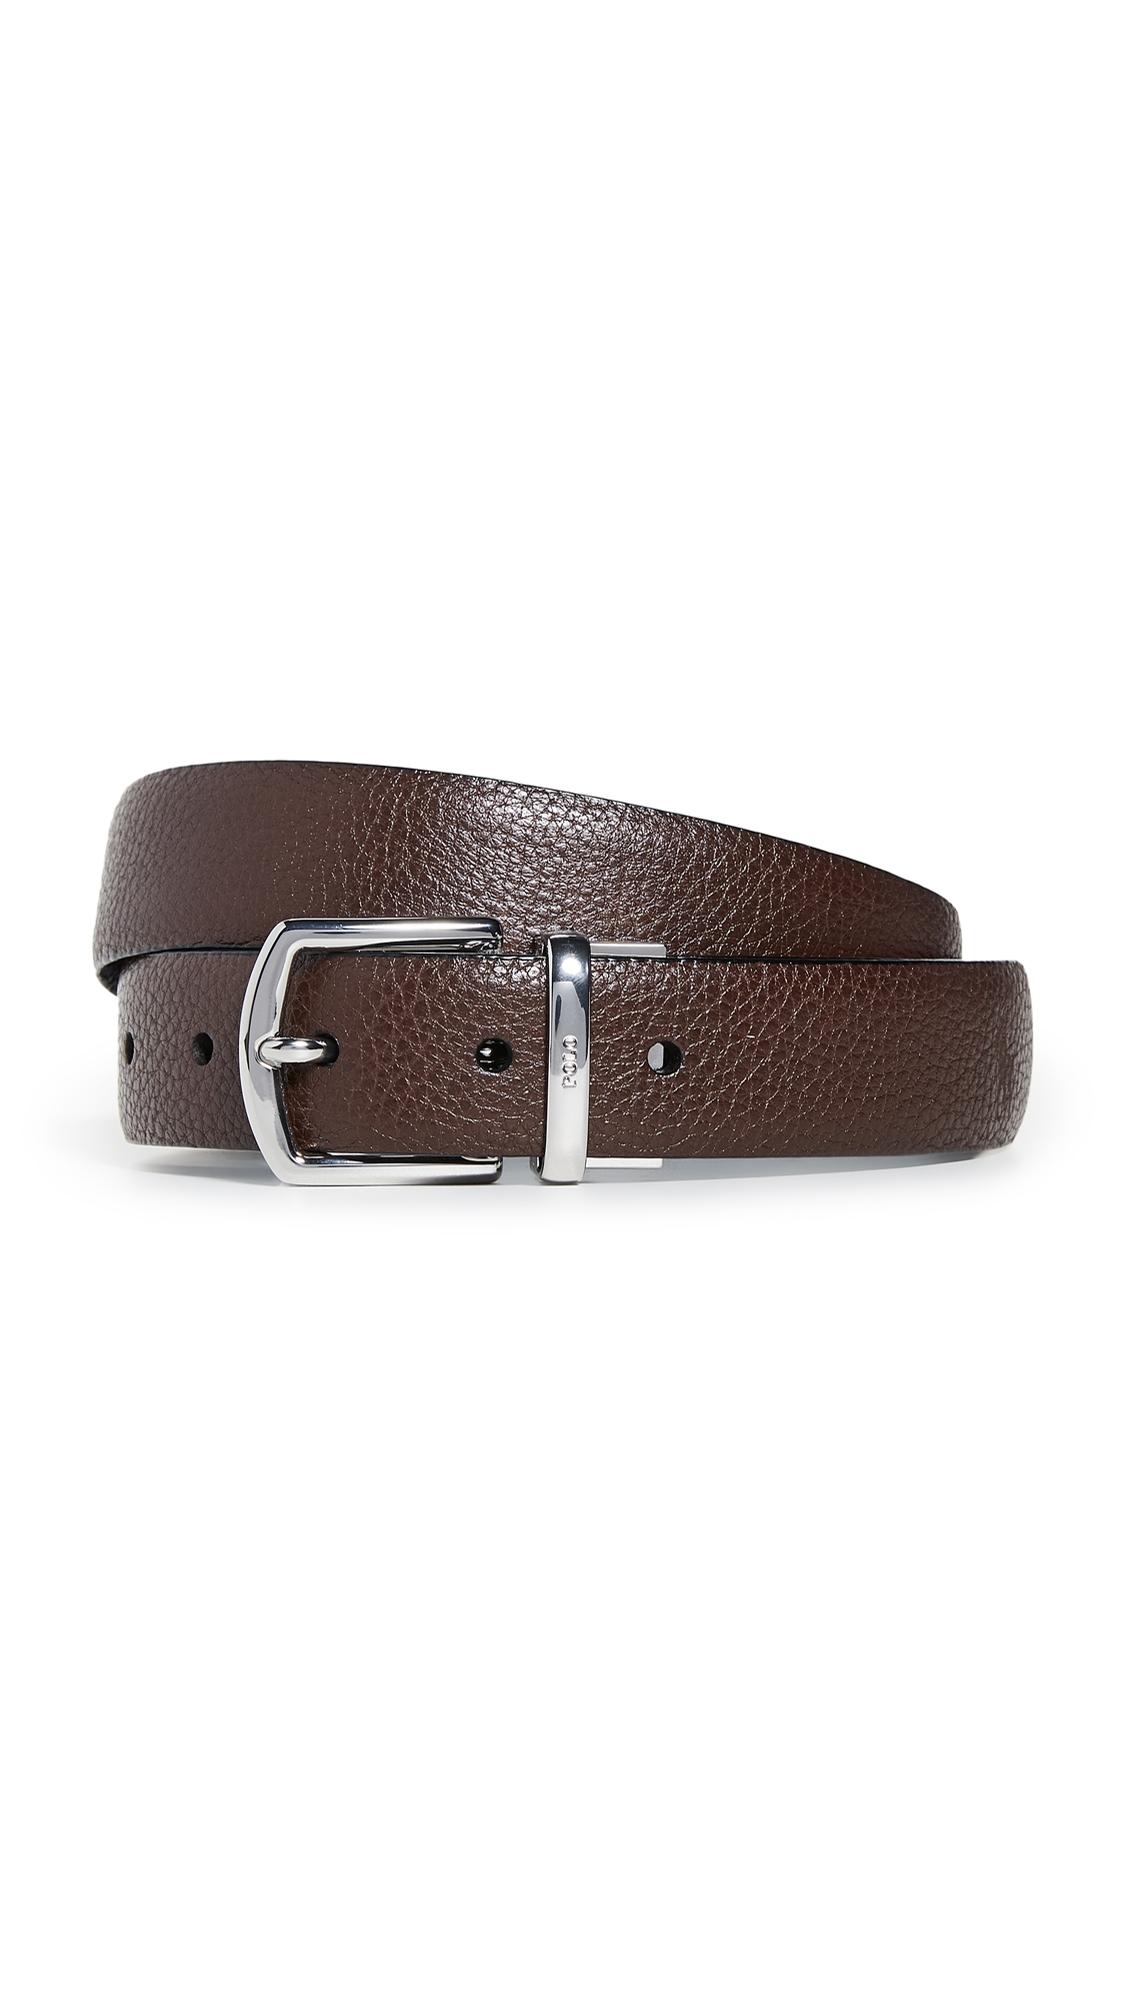 Polo Ralph Lauren 30Mm Reversible Pebbled Leather Dress Belt In Dark Brown/Black